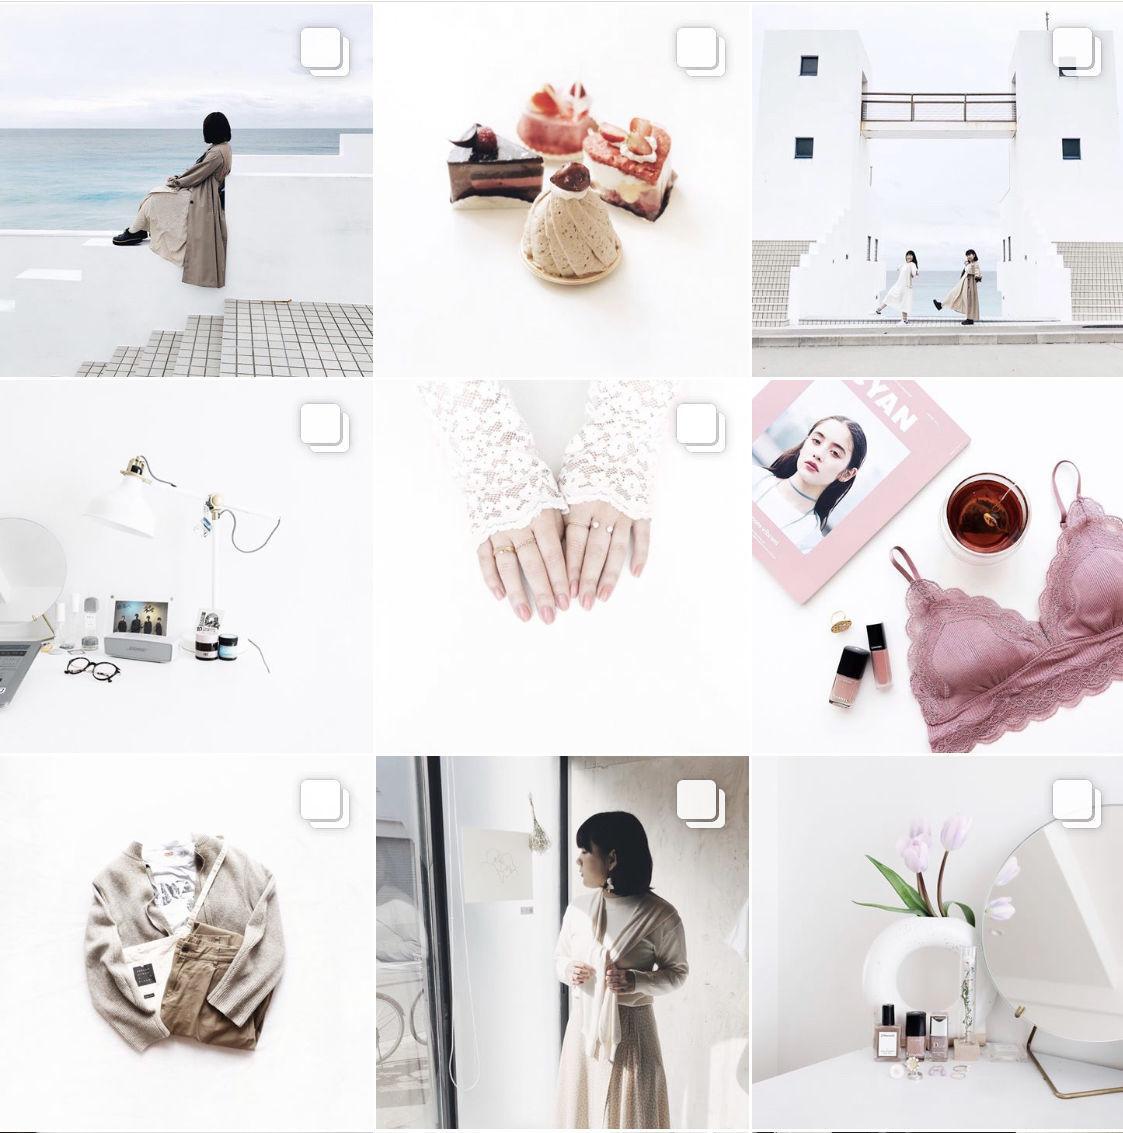 Instagramを活用した集客方法とは?〜具体的なInstagramの活用方法〜